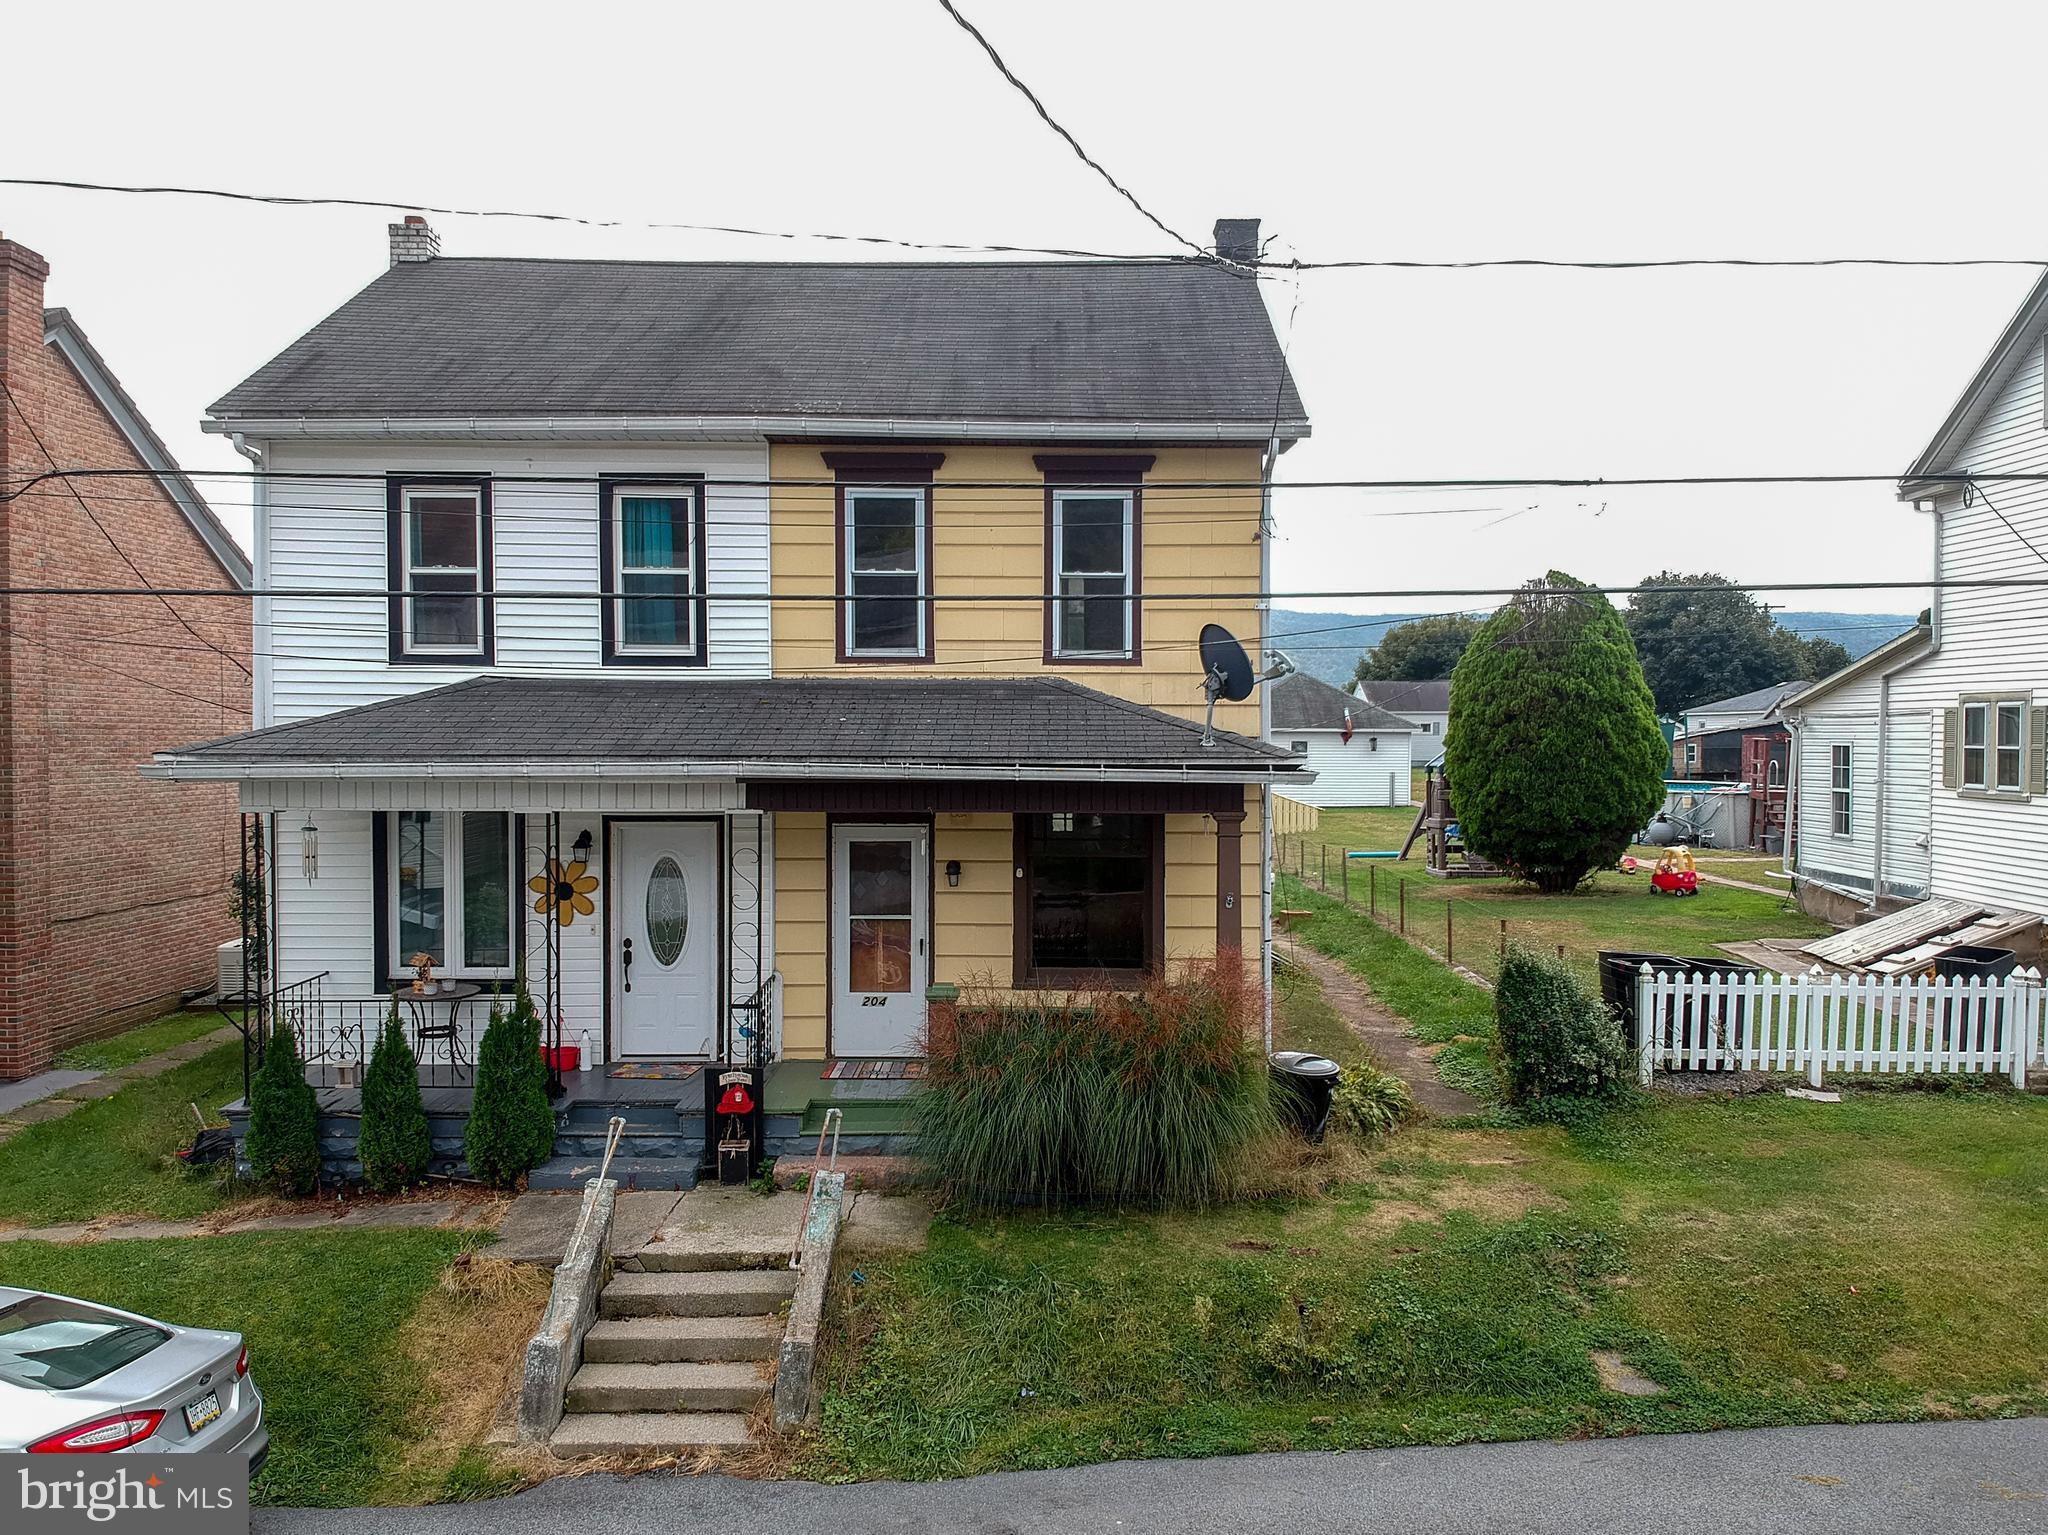 204 WICONISCO STREET, MUIR, PA 17957